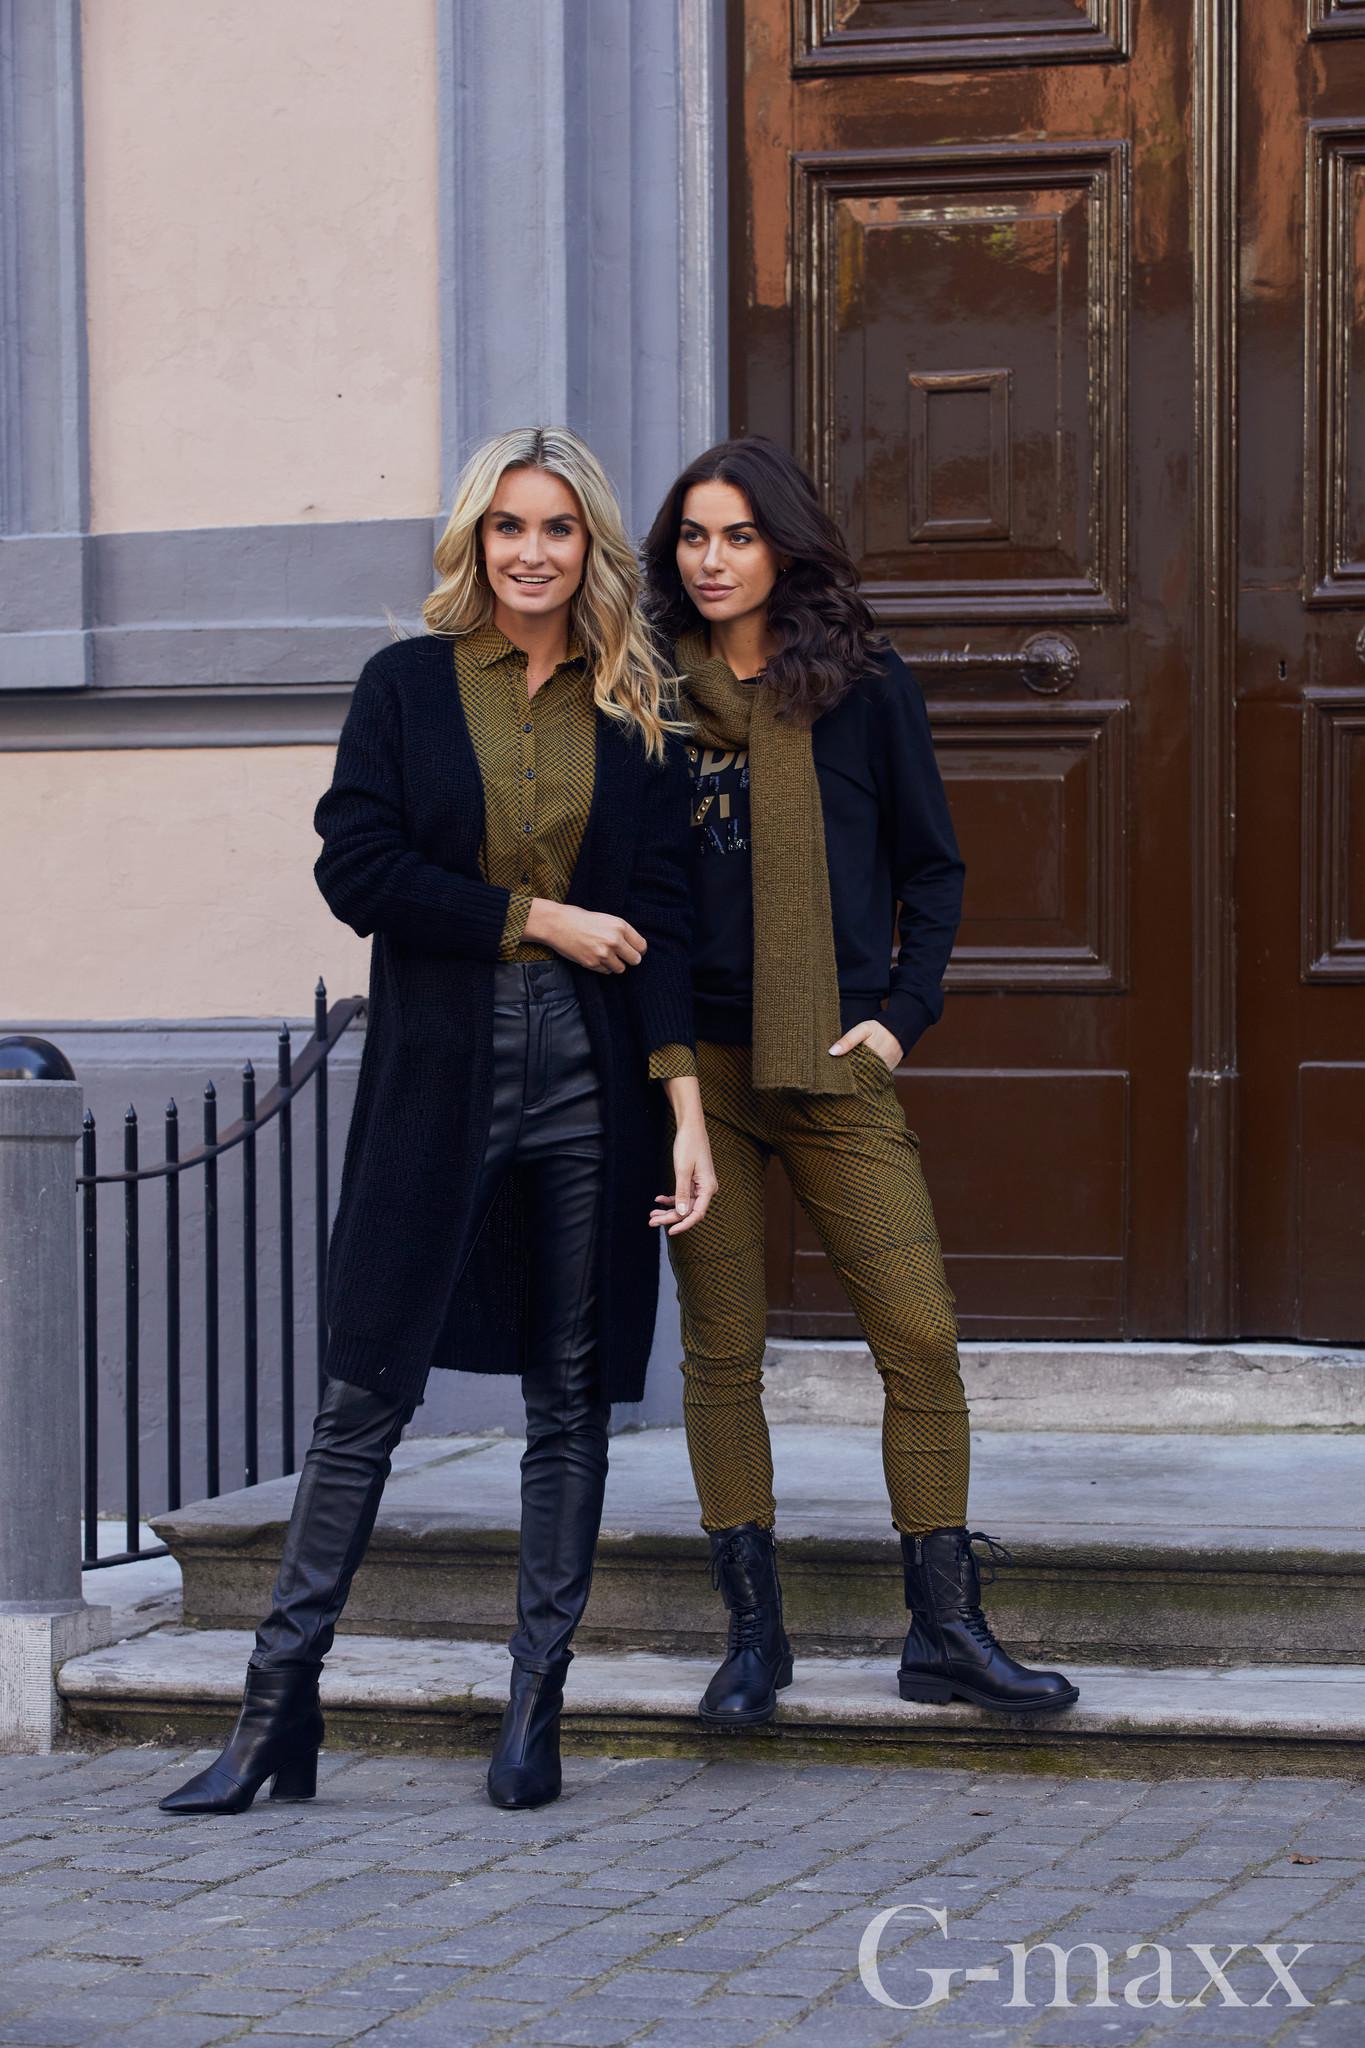 G-Maxx G-Maxx Tiffany broek zwart/olijfgroen